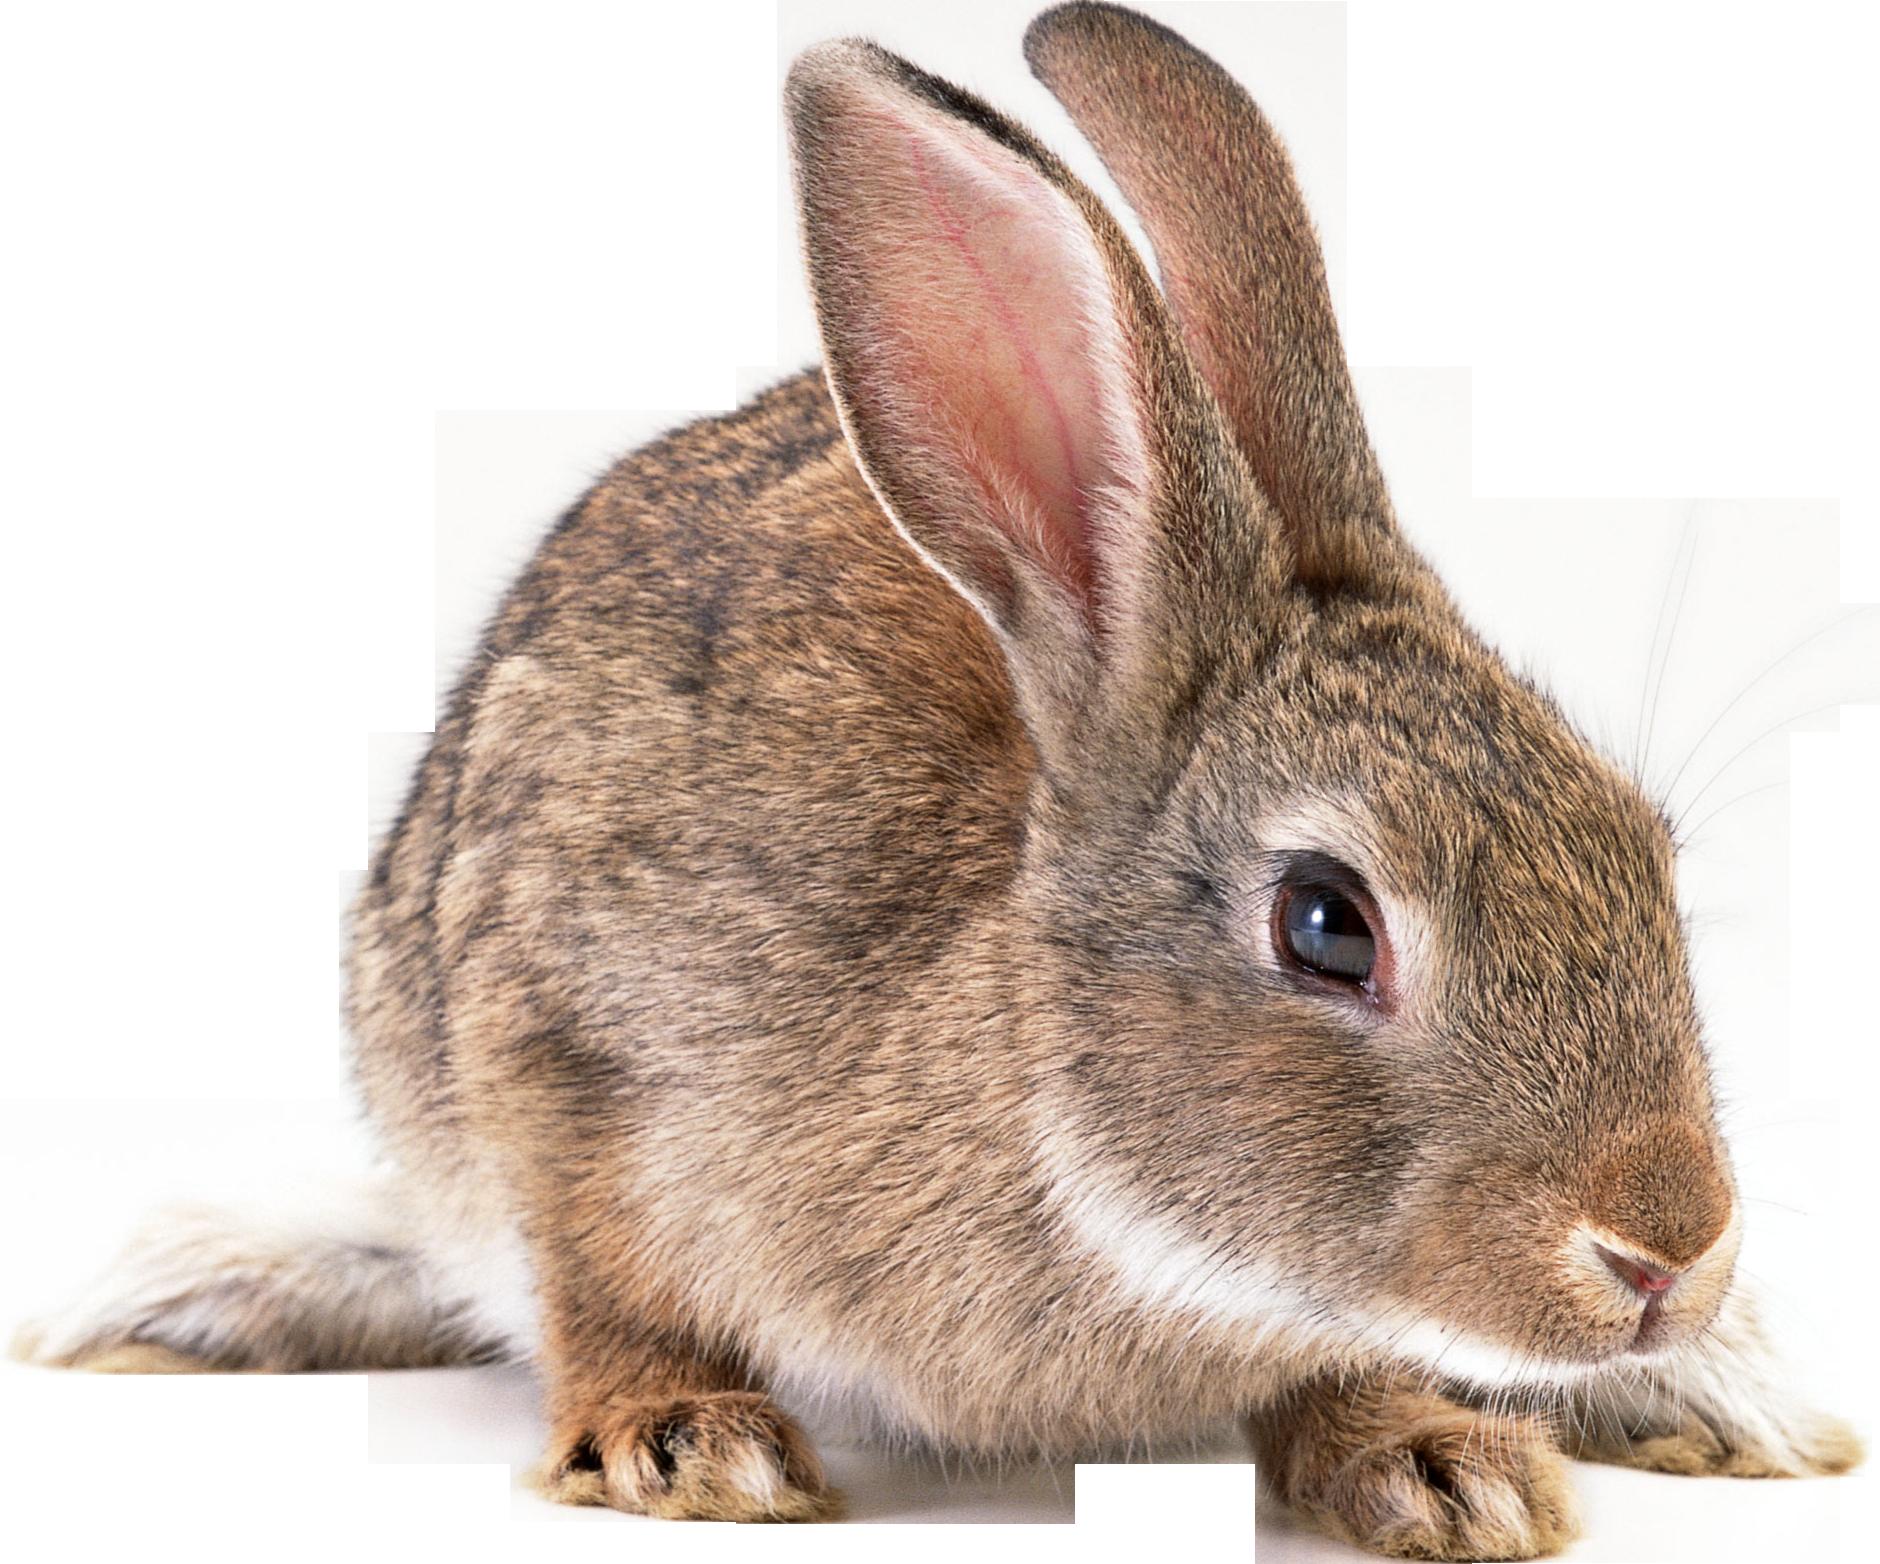 Rabbit PNG - 2876